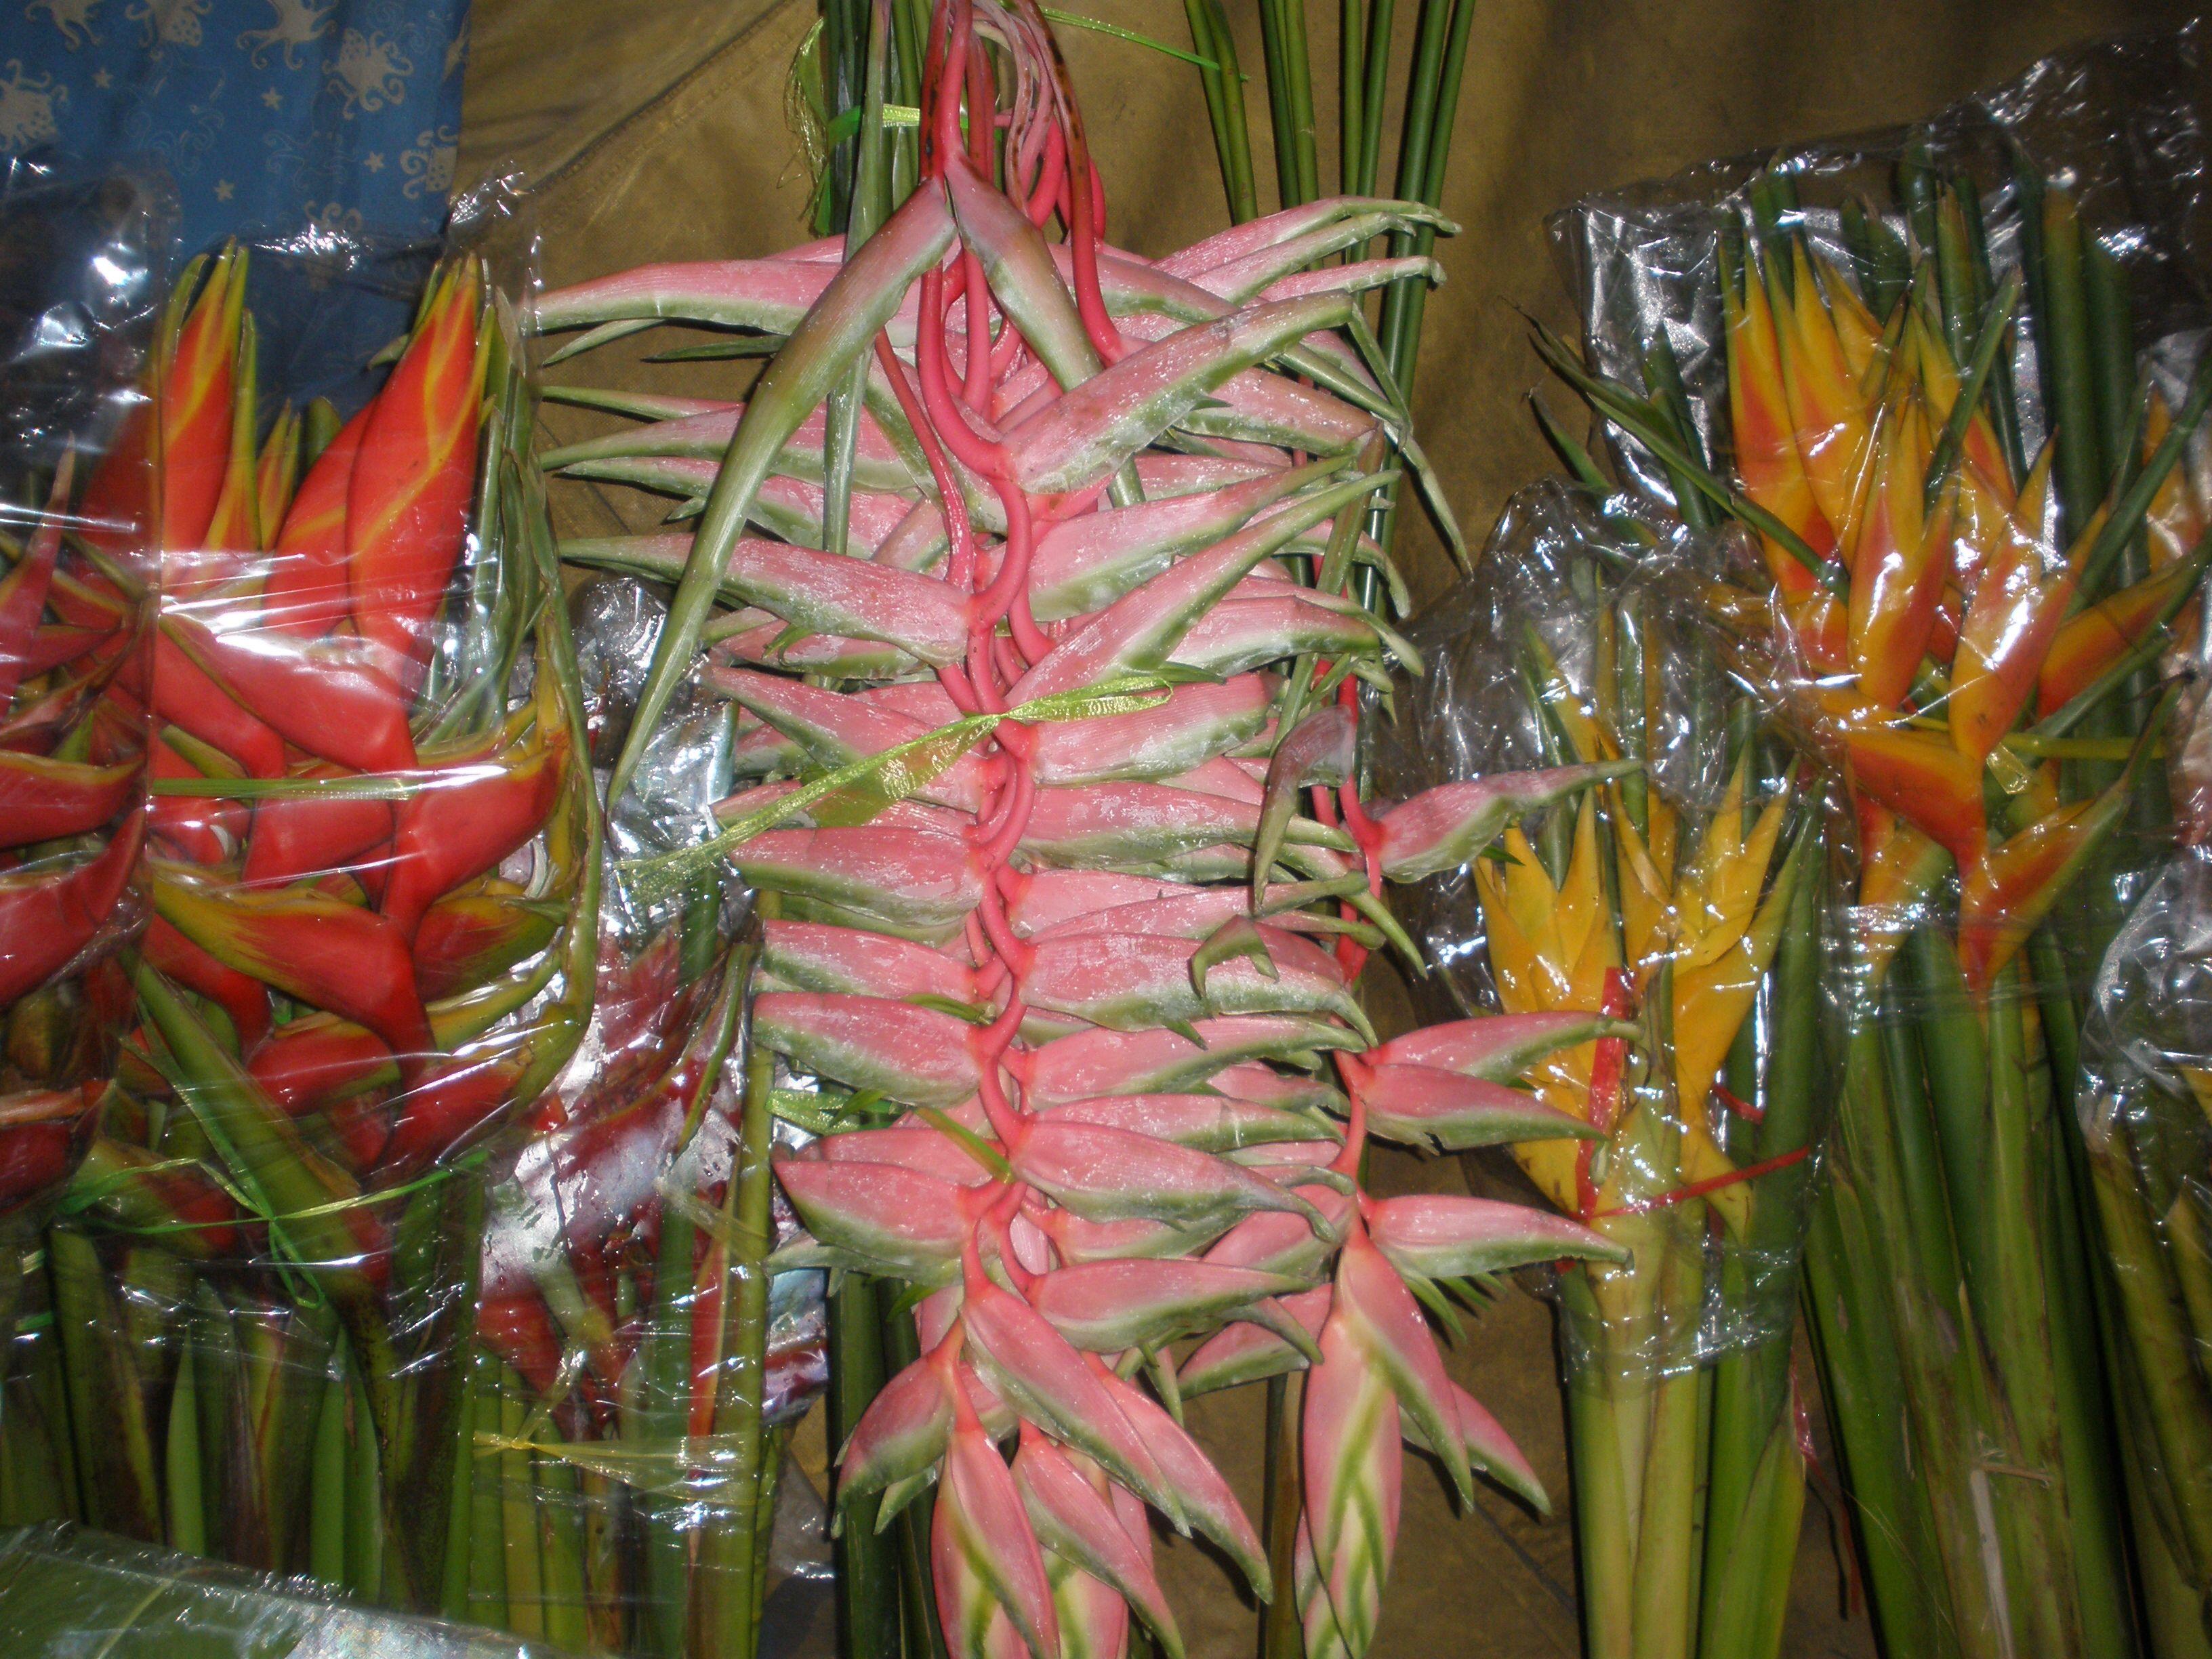 Bloemenmarkt in manilla